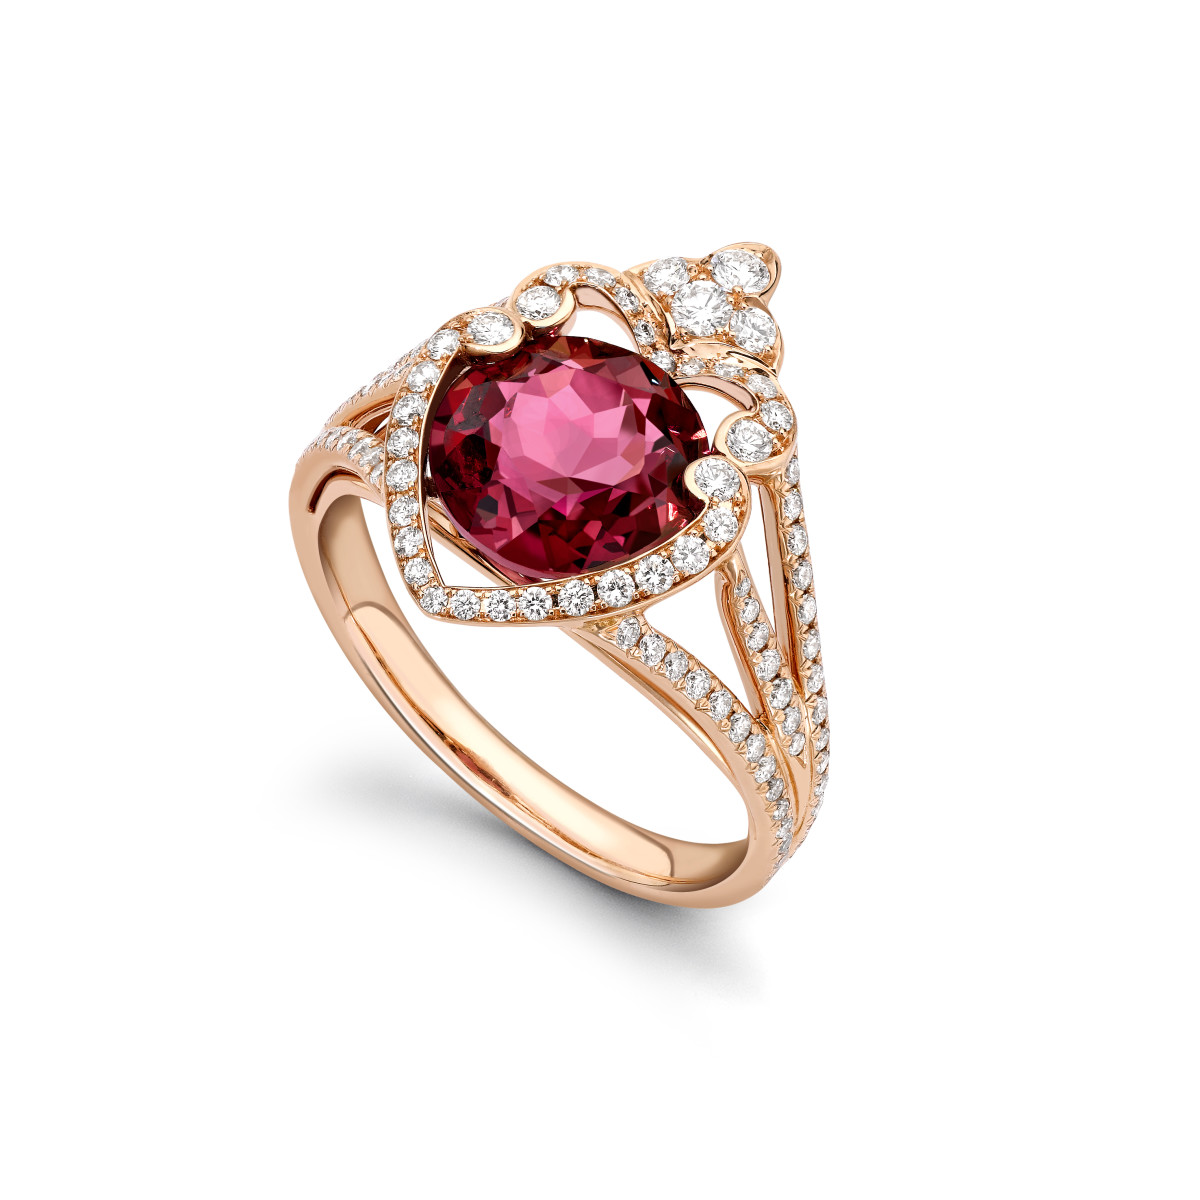 Cullinan Rubilite ring